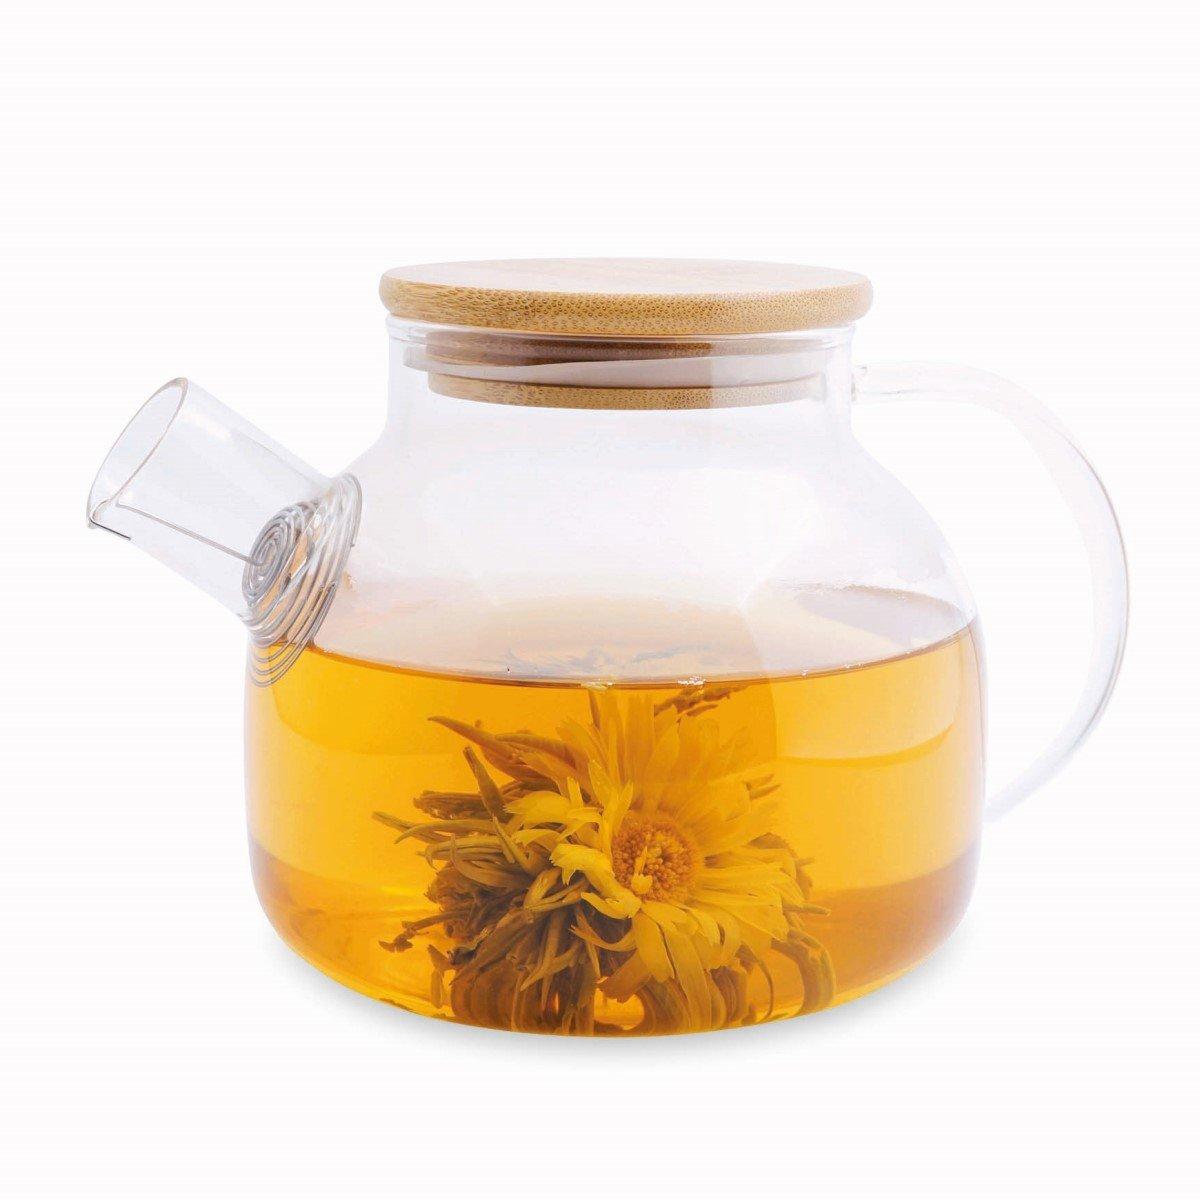 Tekande i glas med bambus låg 750 ml, Annie